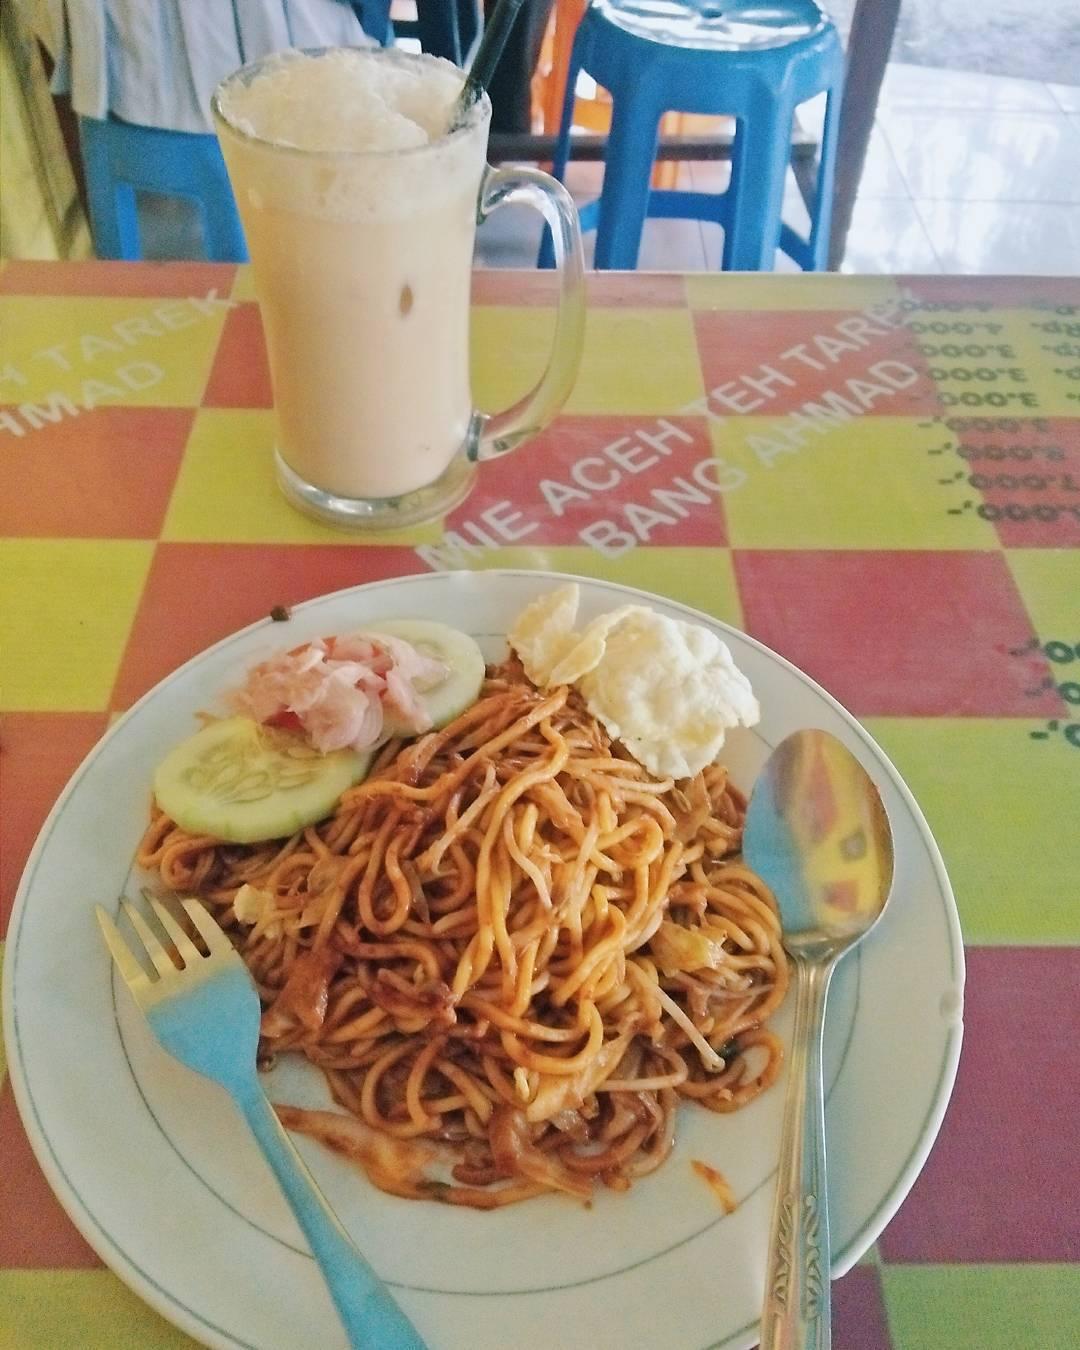 Mie Aceh Original Bang Ahmad, Mie Aceh Original Bang Ahmad Malang, Malang, Kota Malang, Dolan Dolen, Dolaners Mie Aceh Original Bang Ahmad via aisha maulidya25 - Dolan Dolen